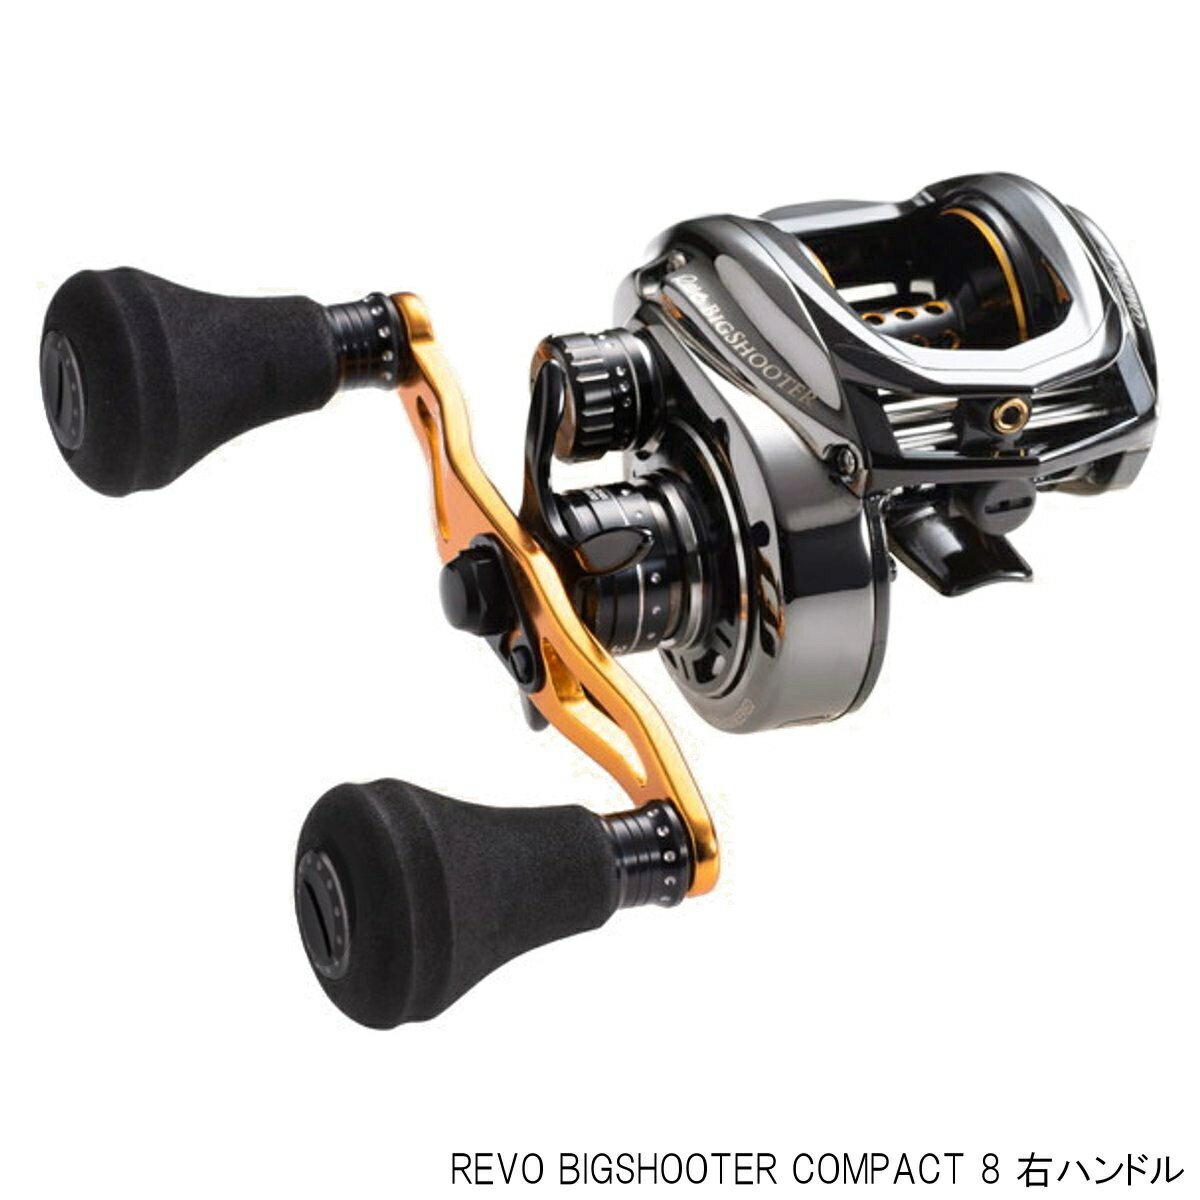 REVO BIGSHOOTER COMPACT 8 右ハンドル【送料無料】